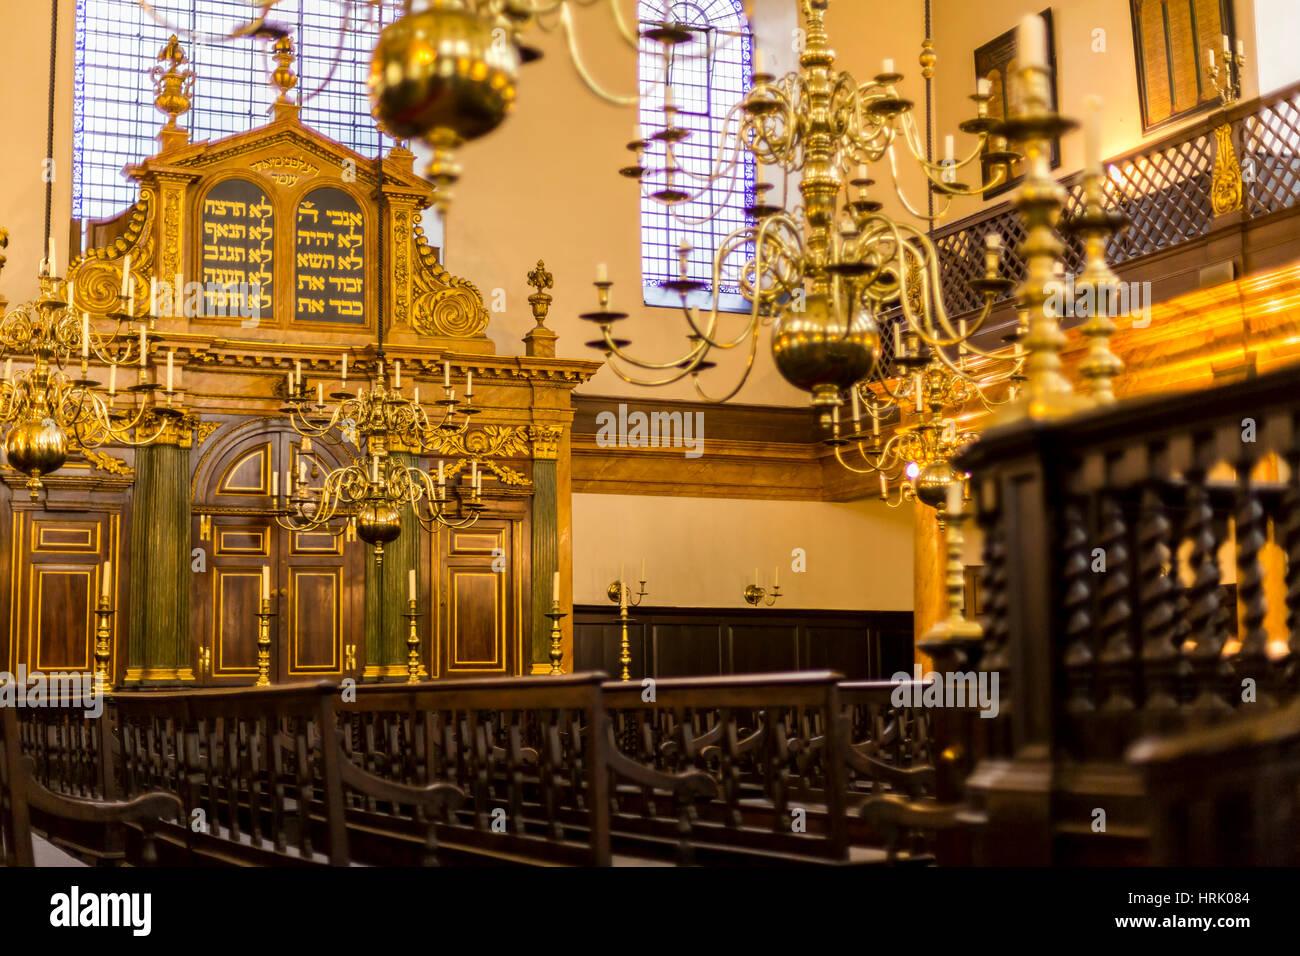 Bevis Marks Interior, The oldest Synangogue in Western Europe, London, England UK - Stock Image